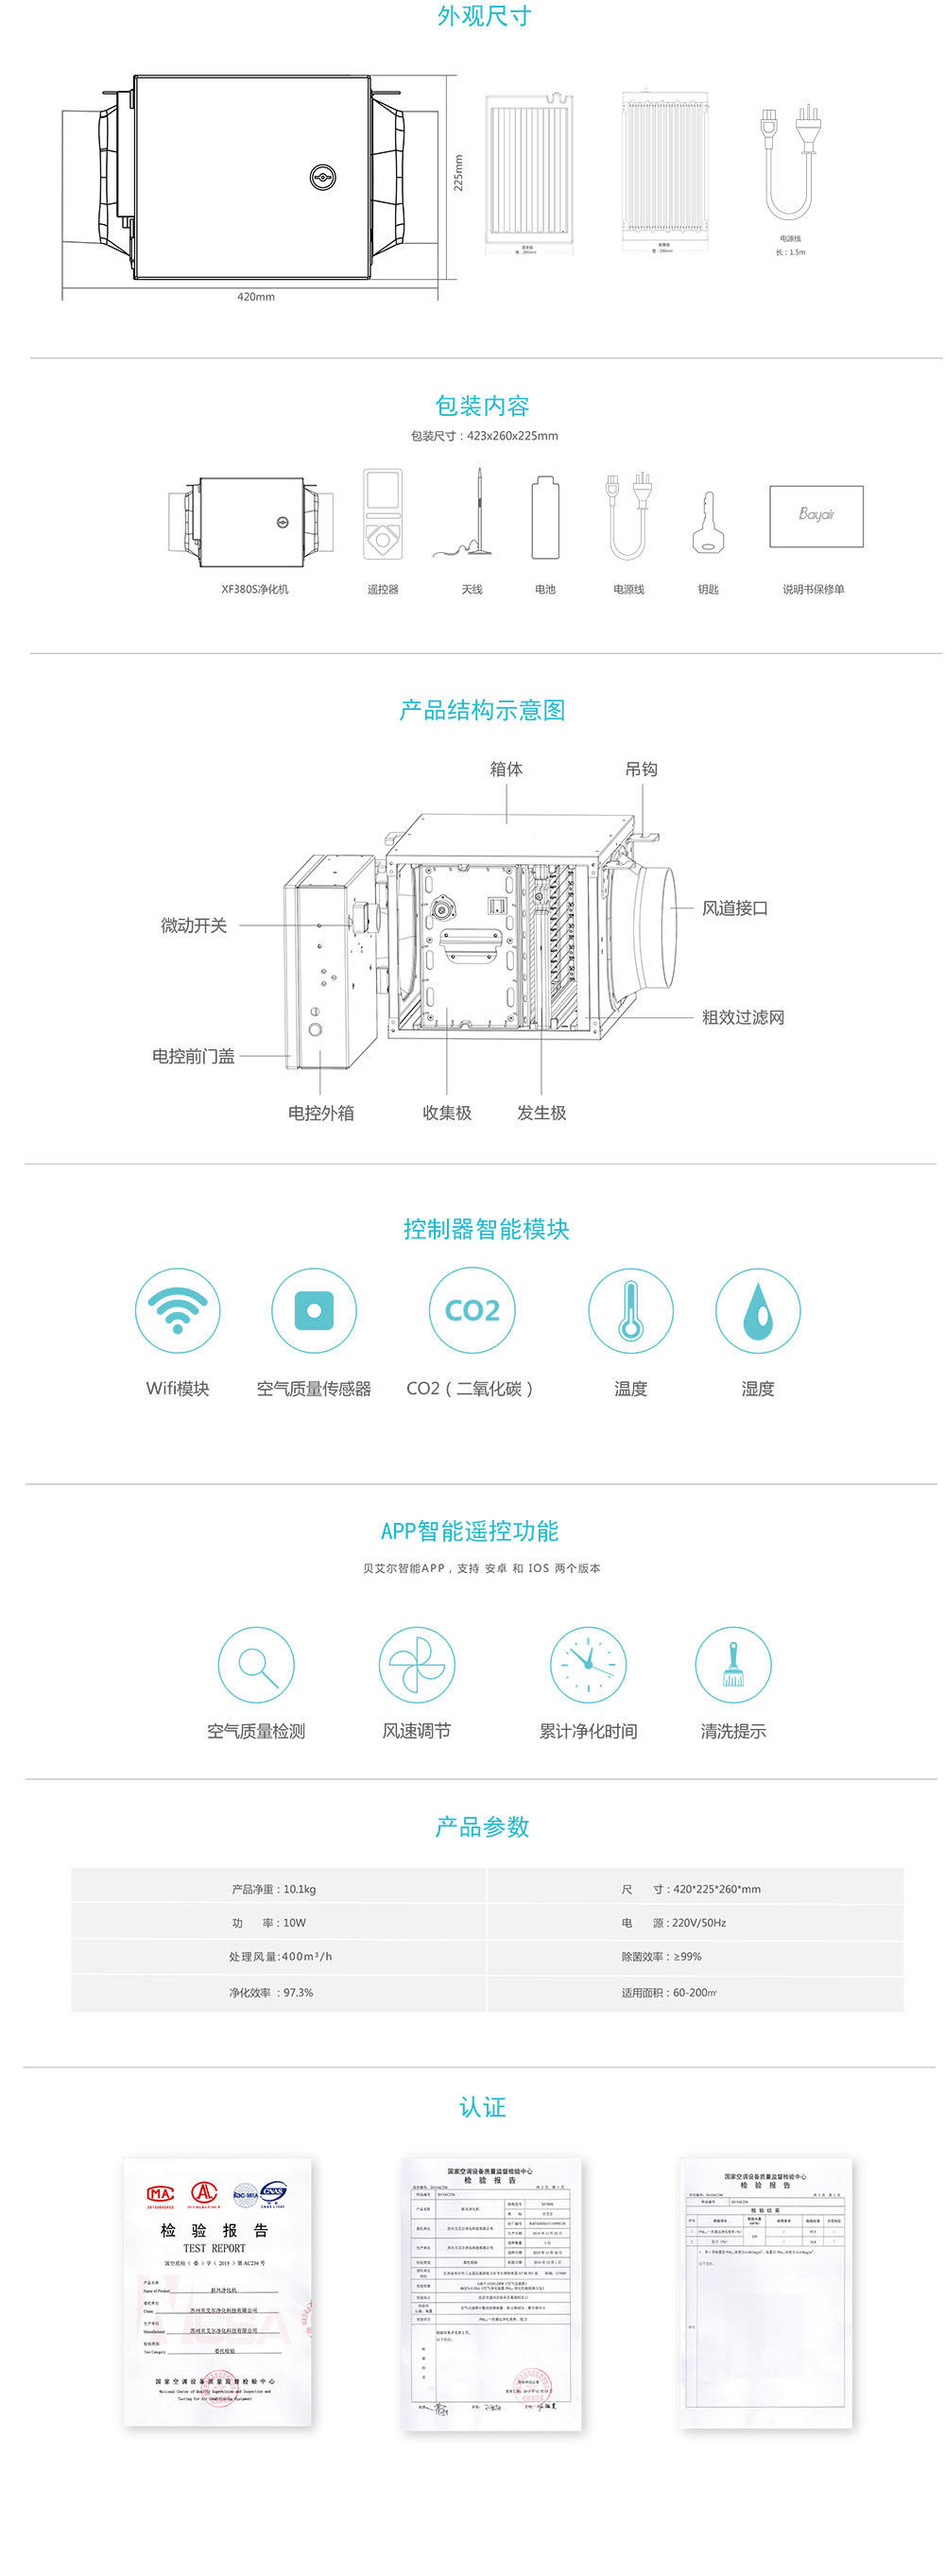 XF380S产品描述,产品规格(净化原理同FA20).jpg